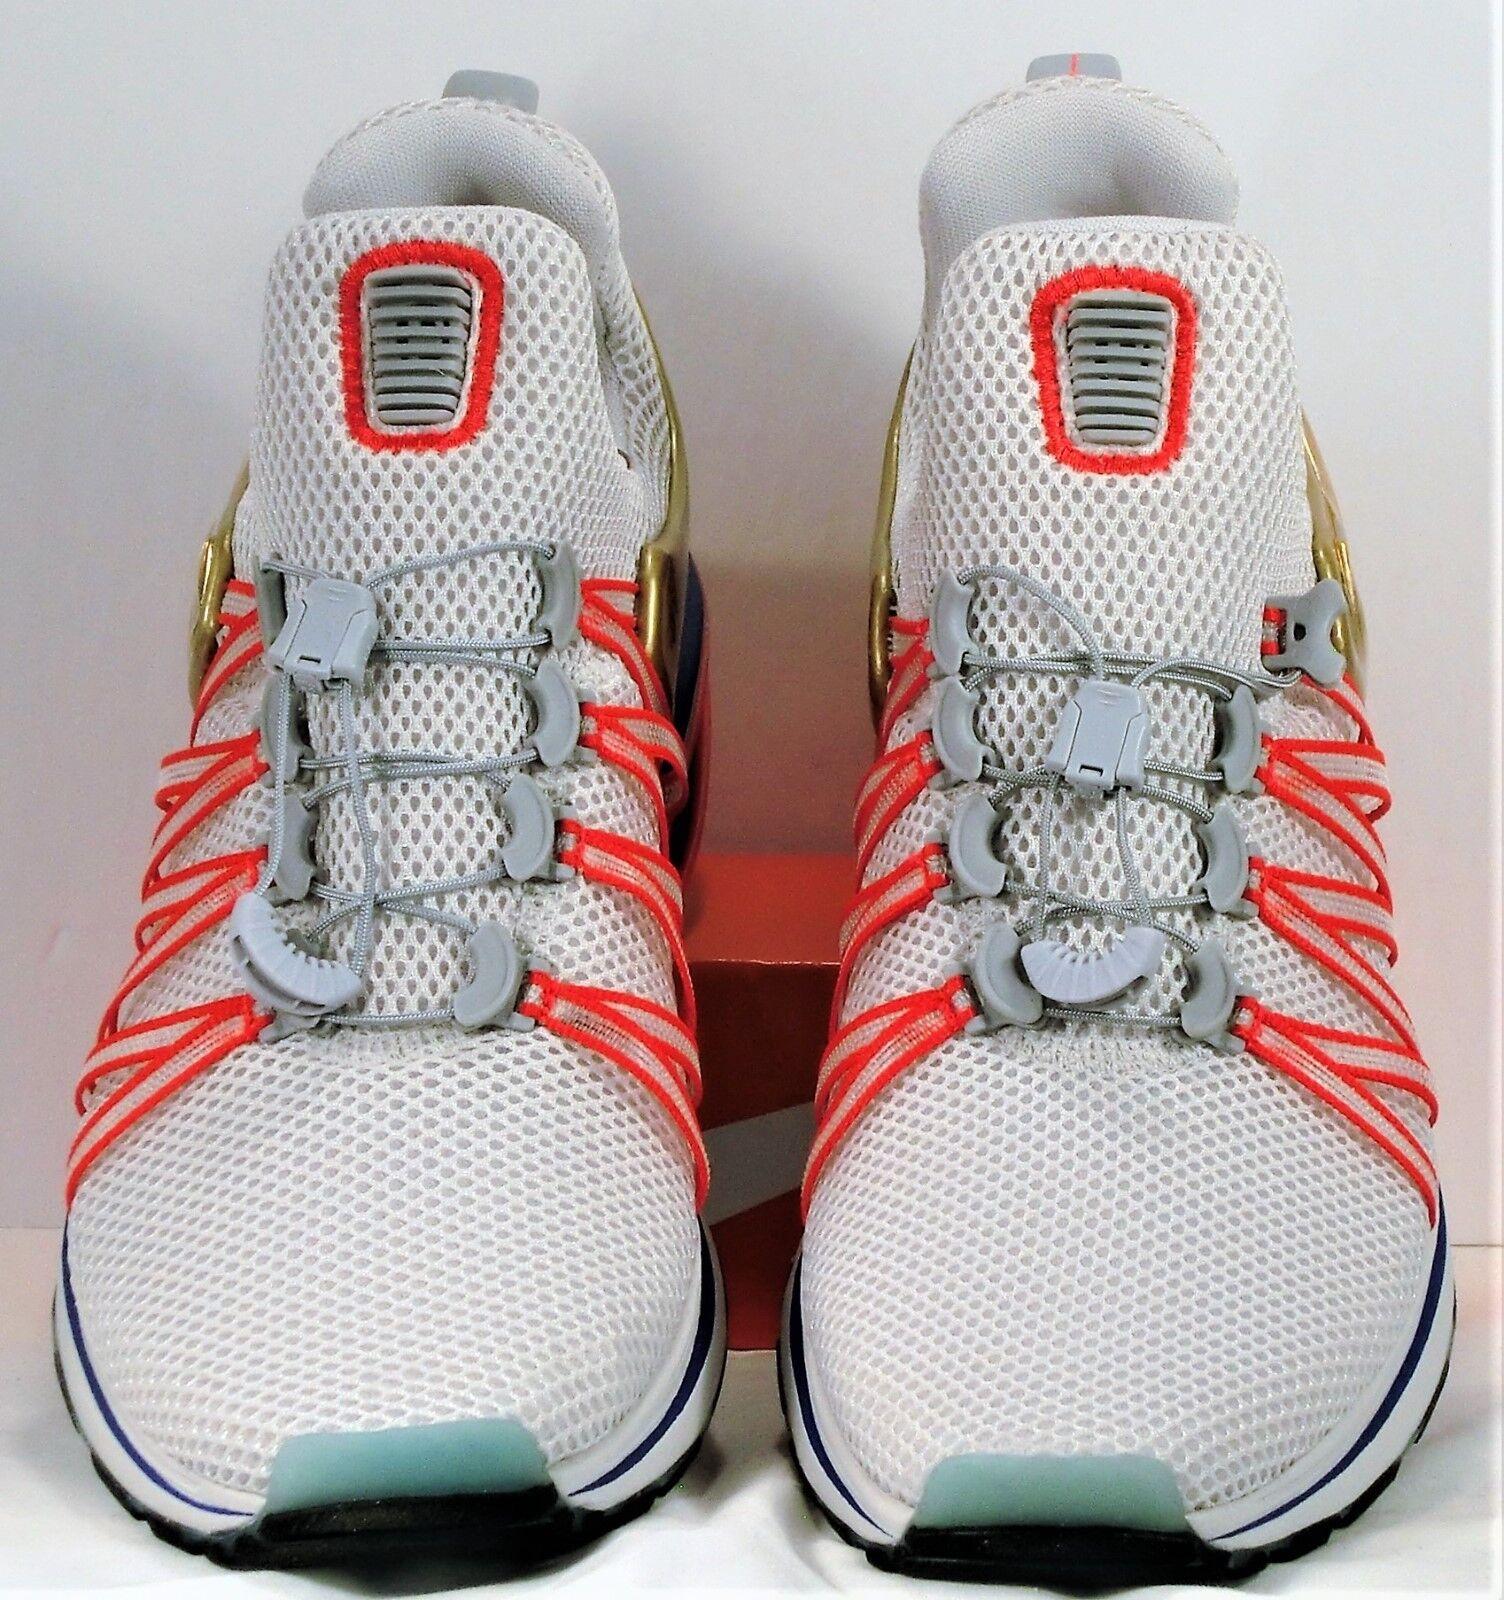 Nike shox schwerkraft riesige Grau Grau riesige & metallic gold laufschuhe sz 11 neue aq8553 009 ee06e9